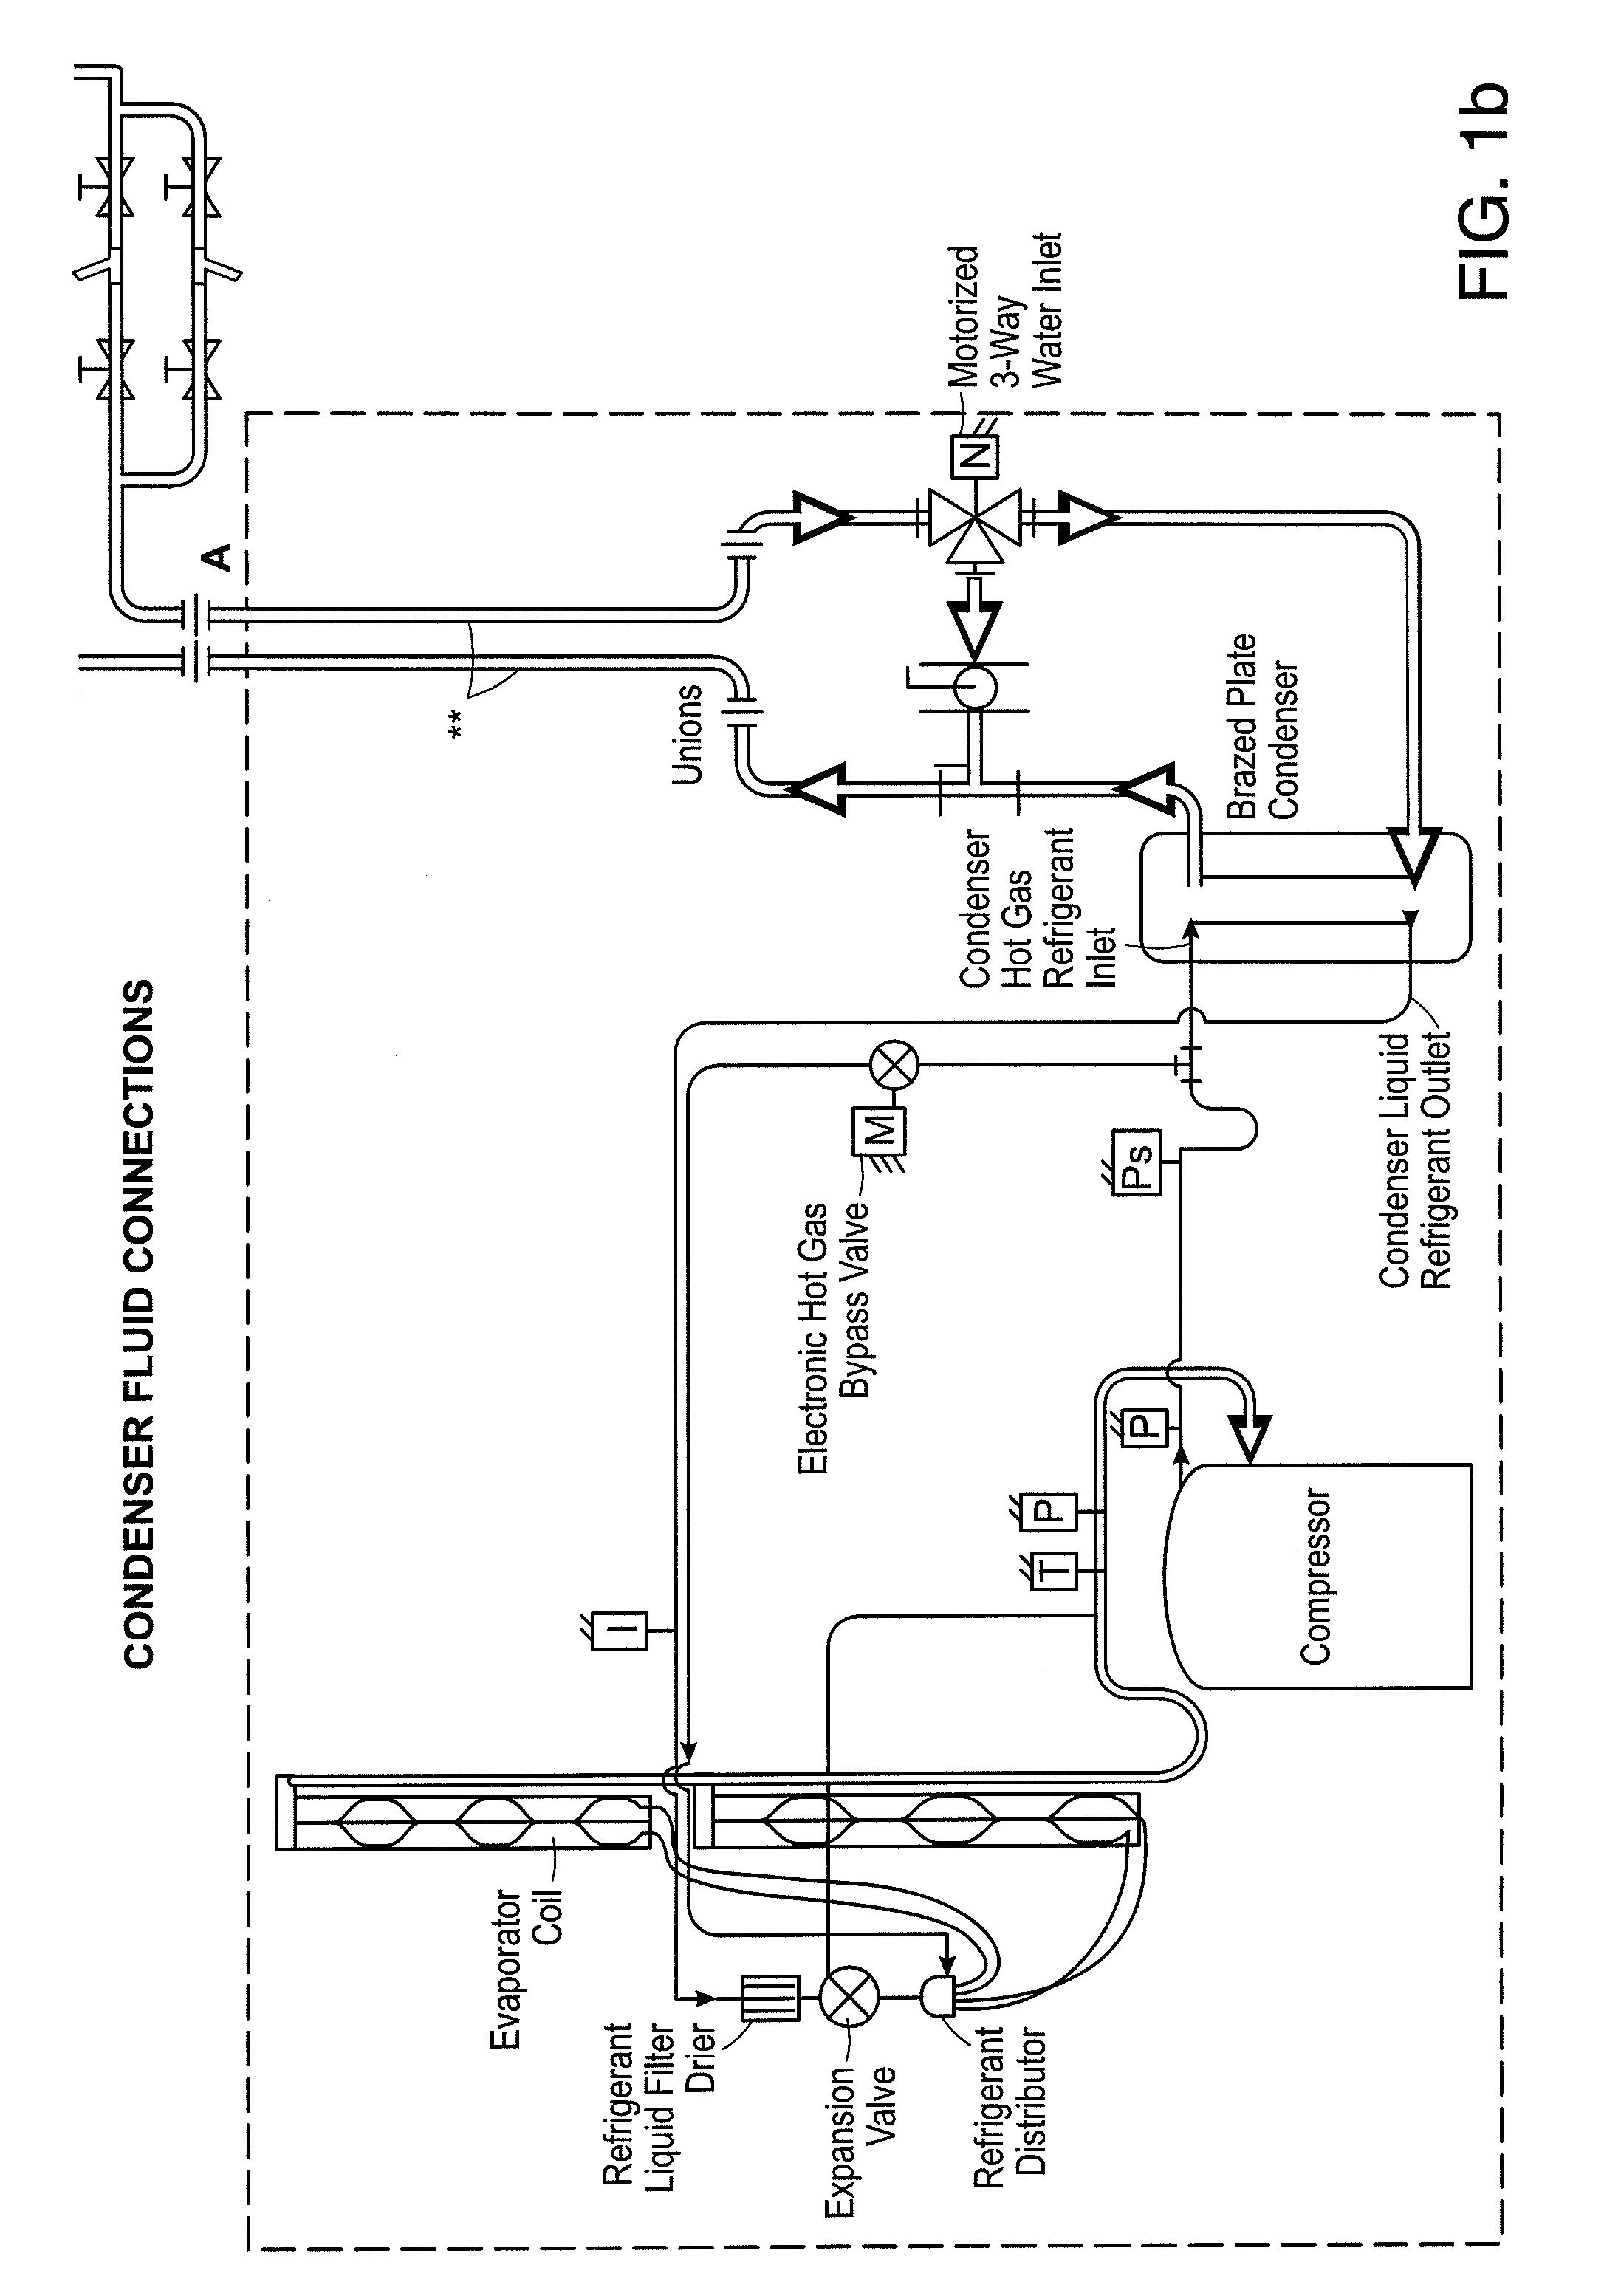 Patent US 9,568,206 B2